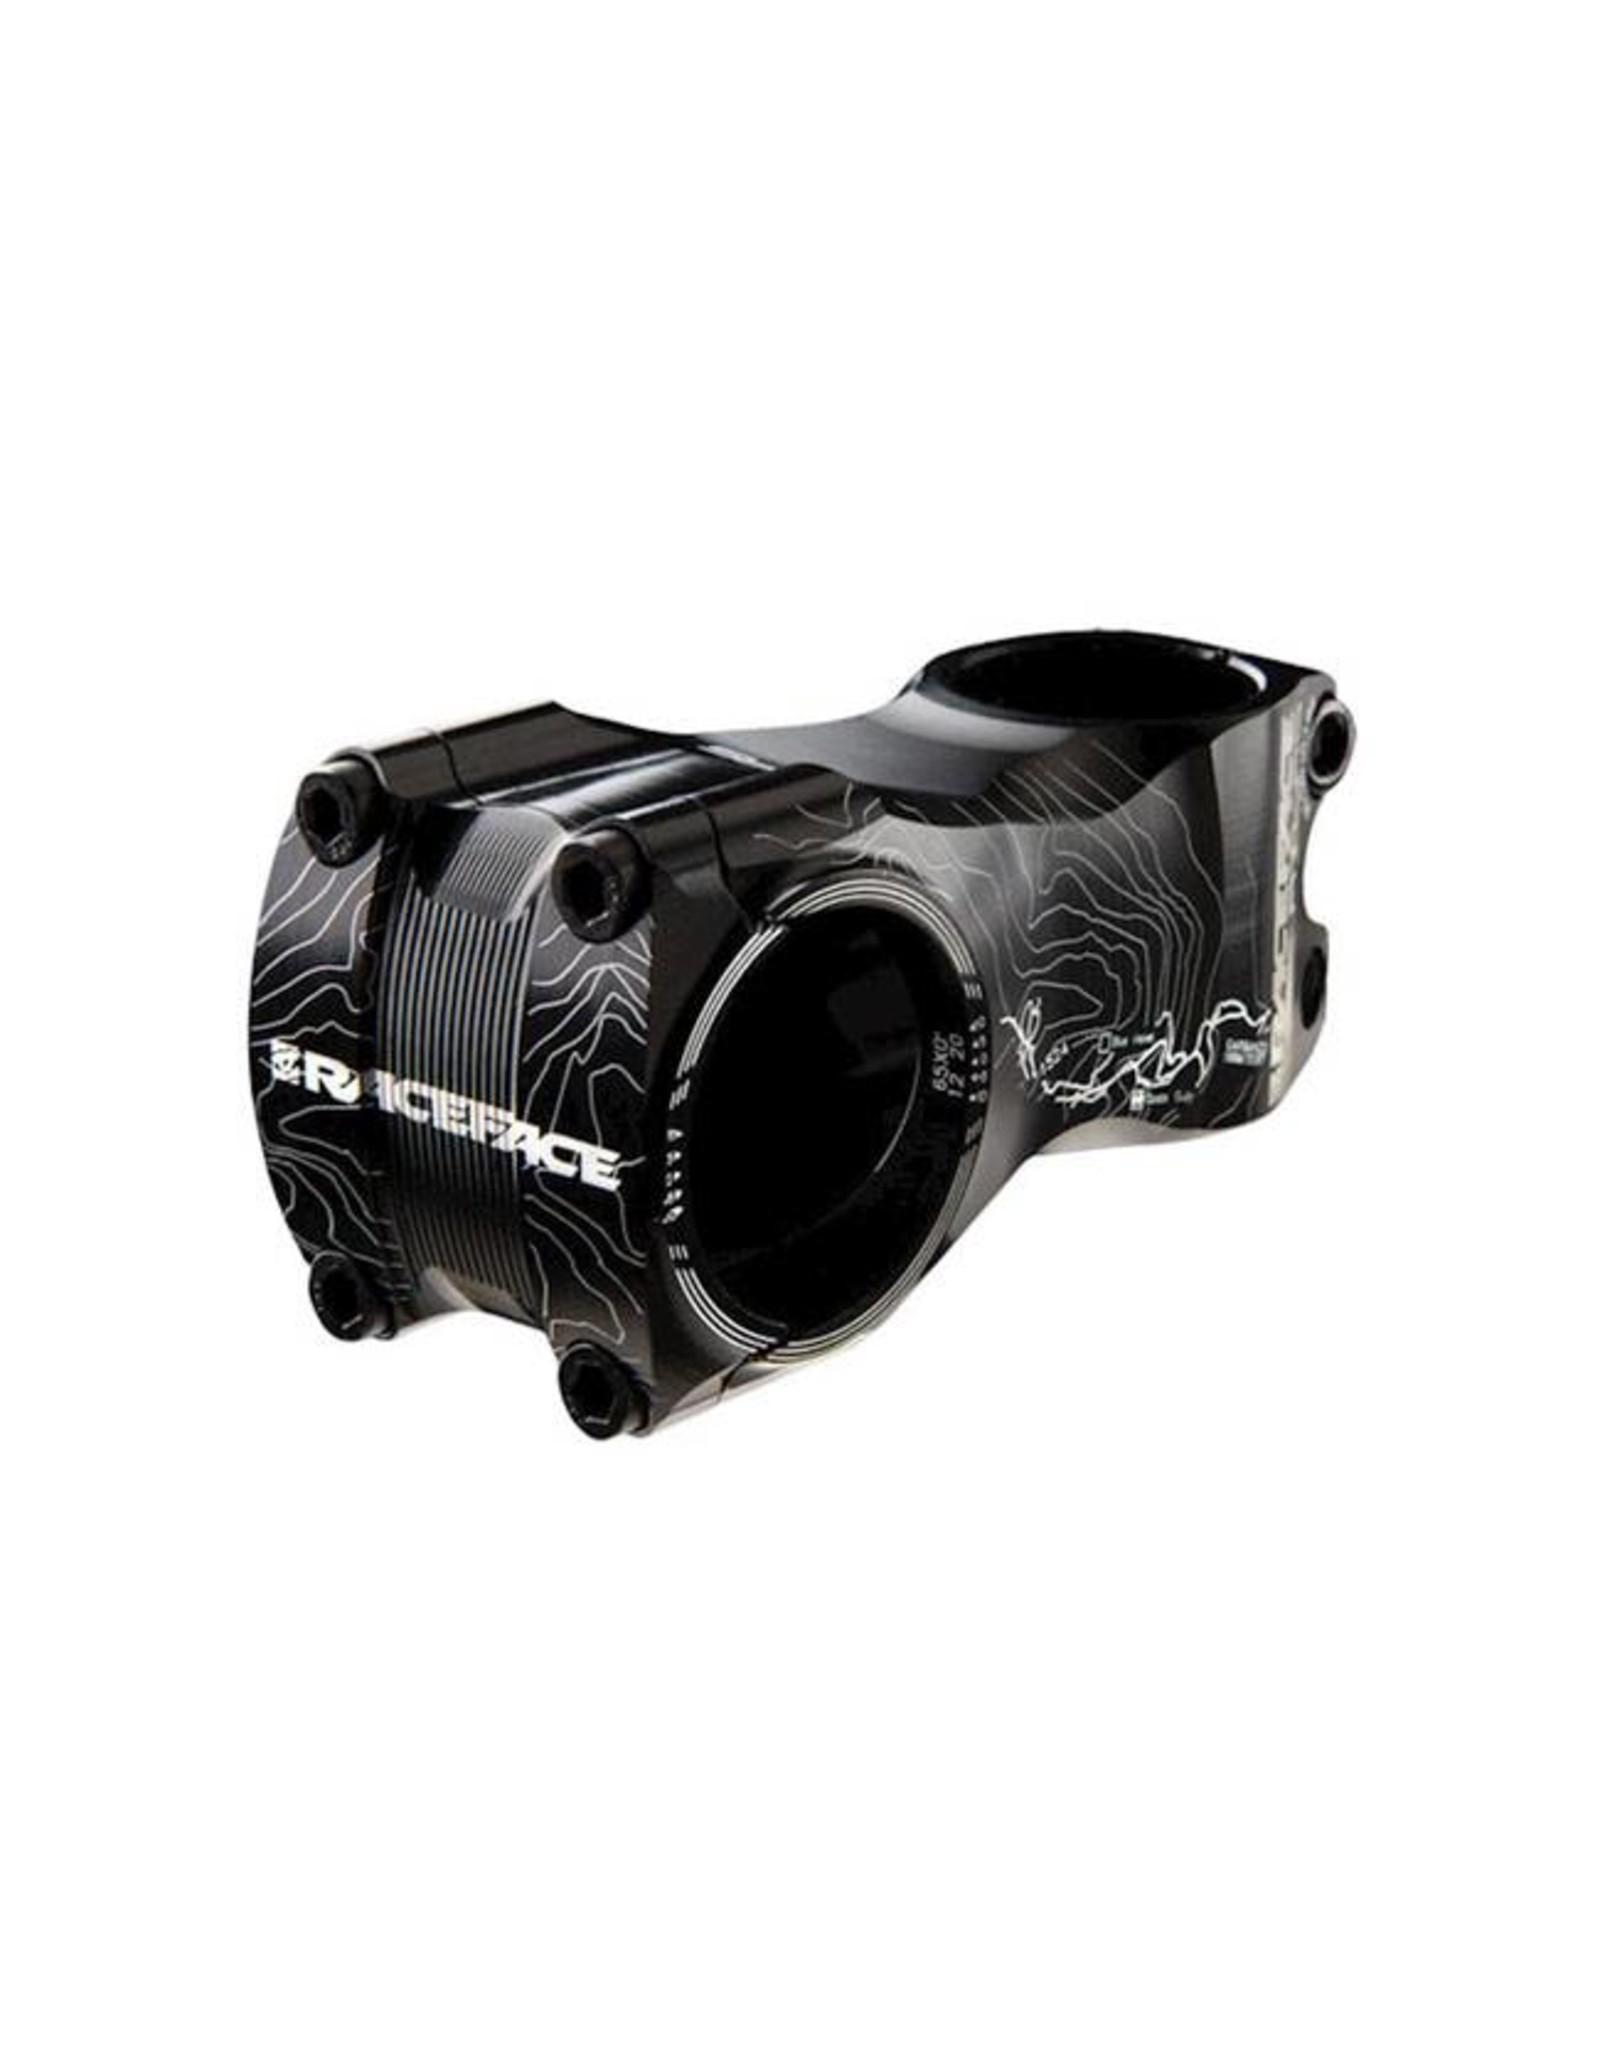 RaceFace RaceFace Atlas 35 Stem, 65mm +/- 0 degree Black